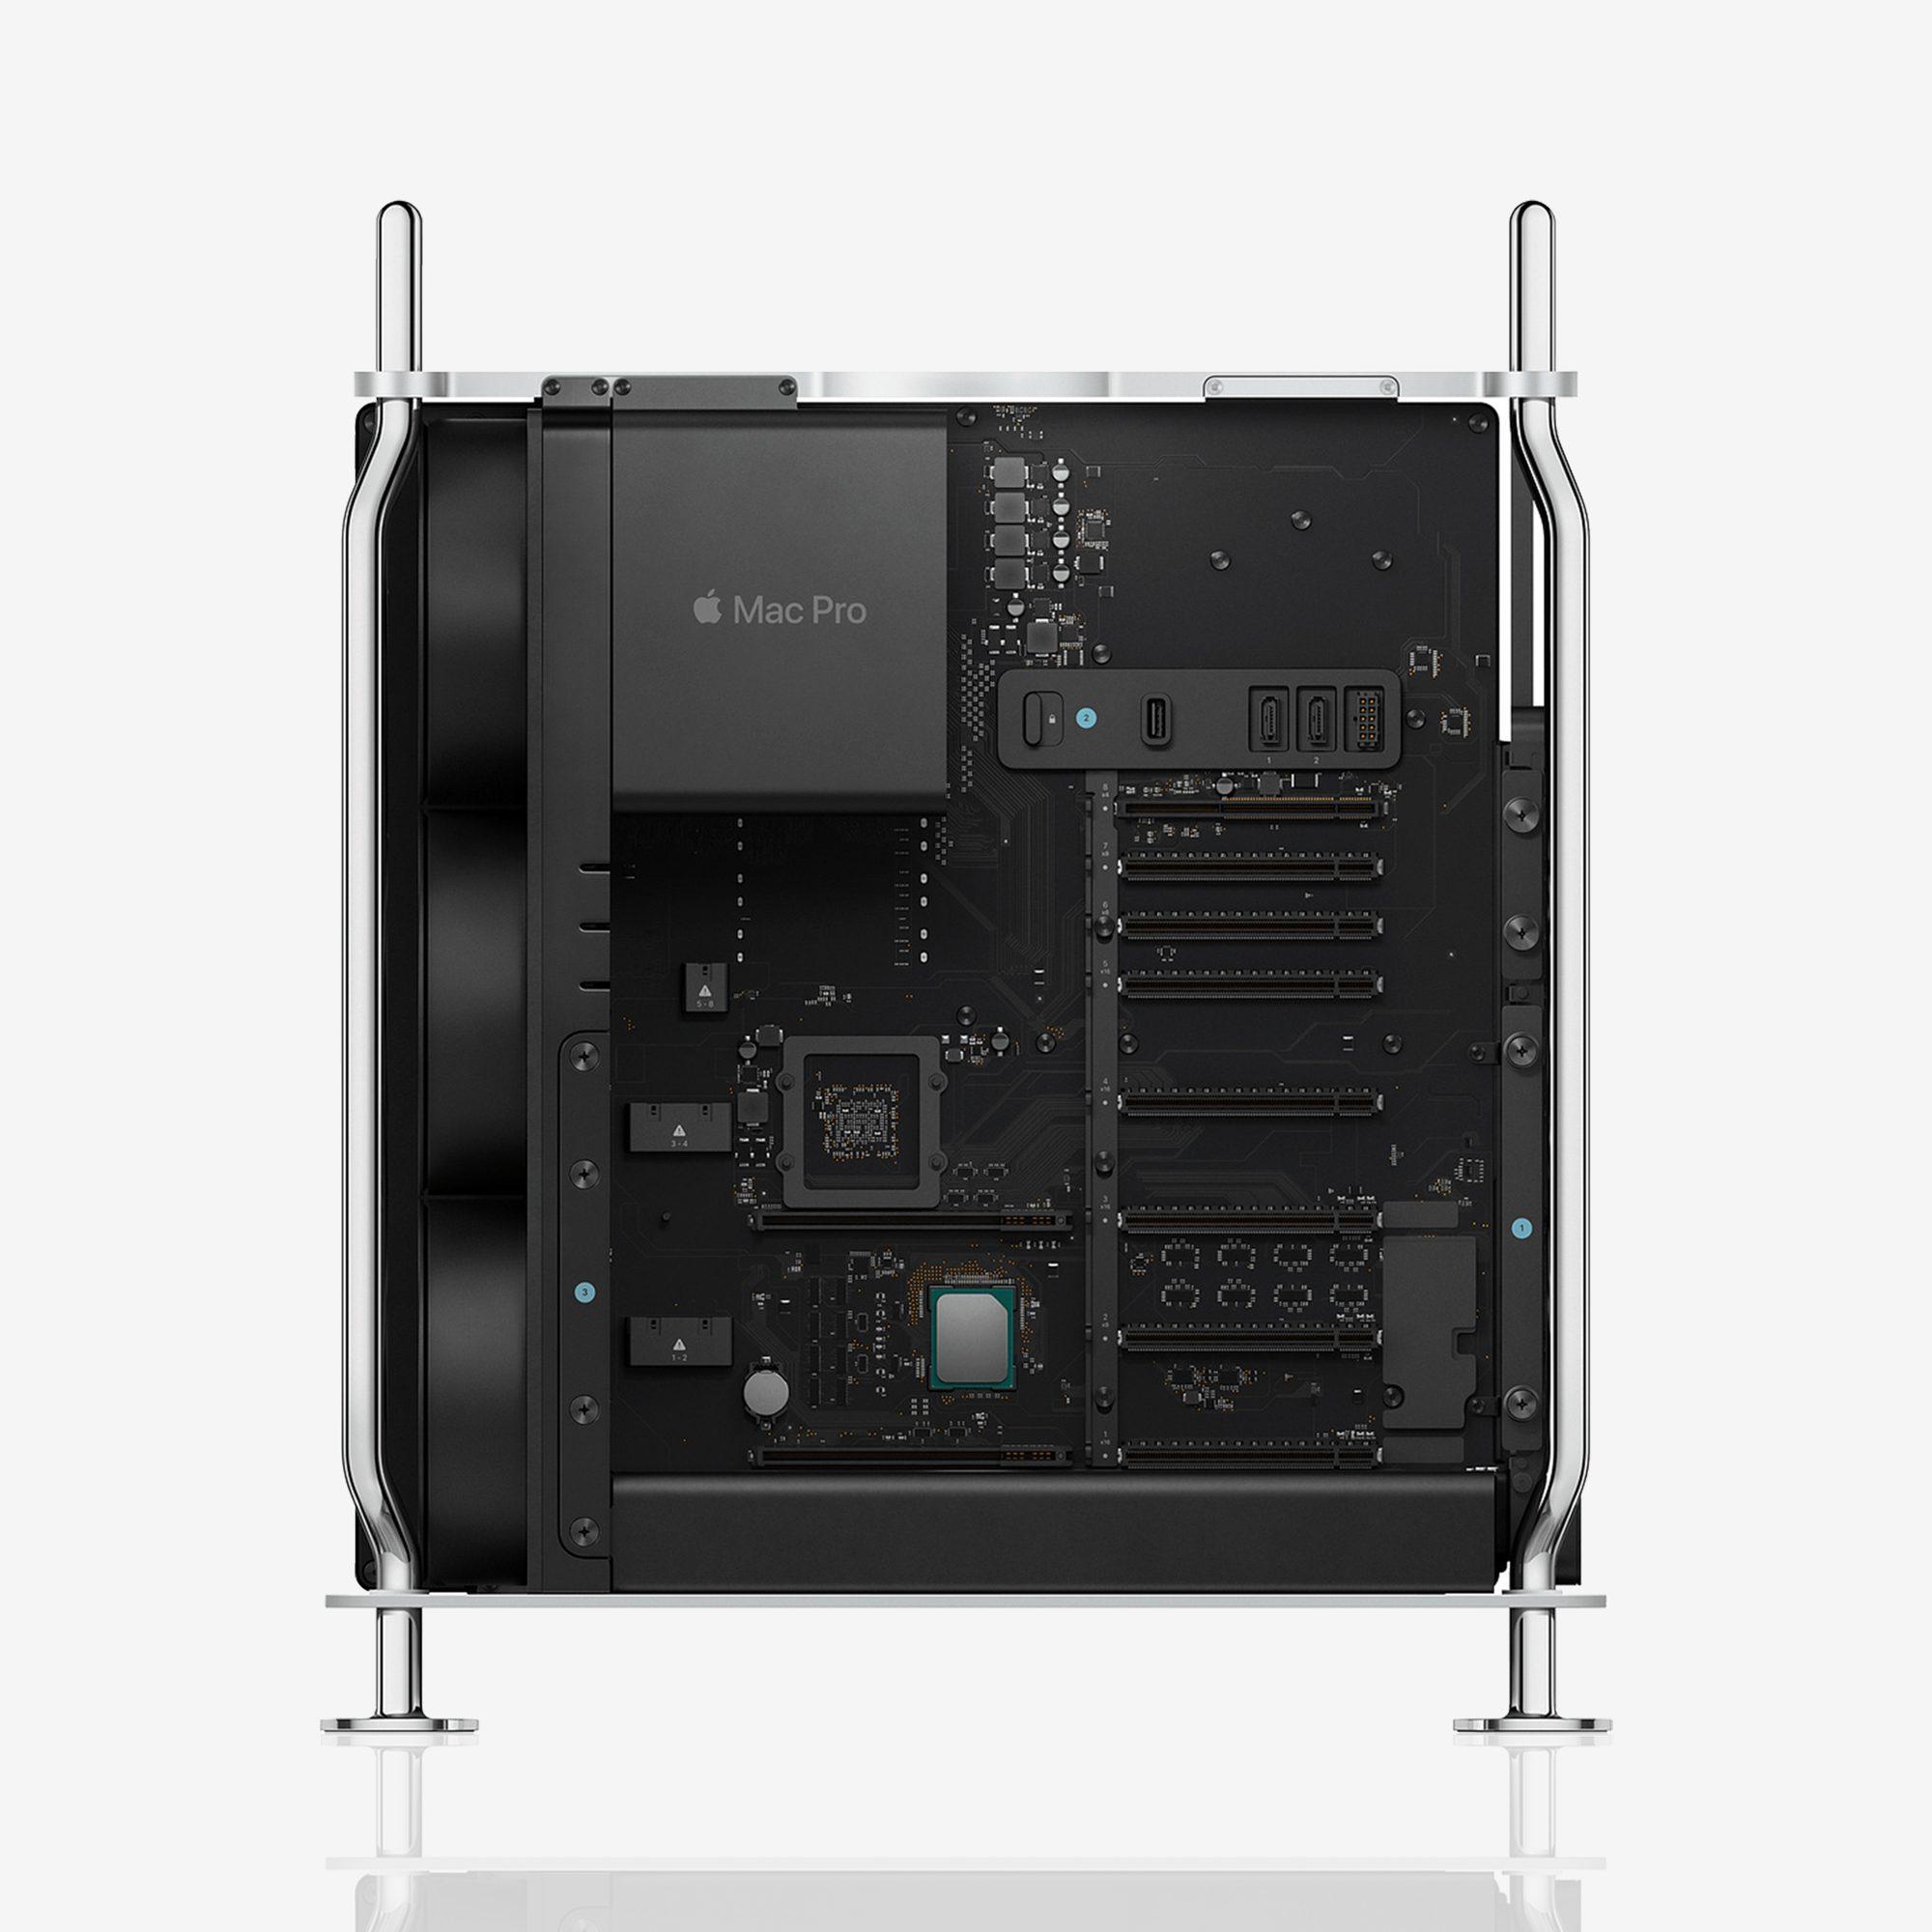 1 x Mac Pro 2019 Upgrade | Upgrade your CPU and RAM